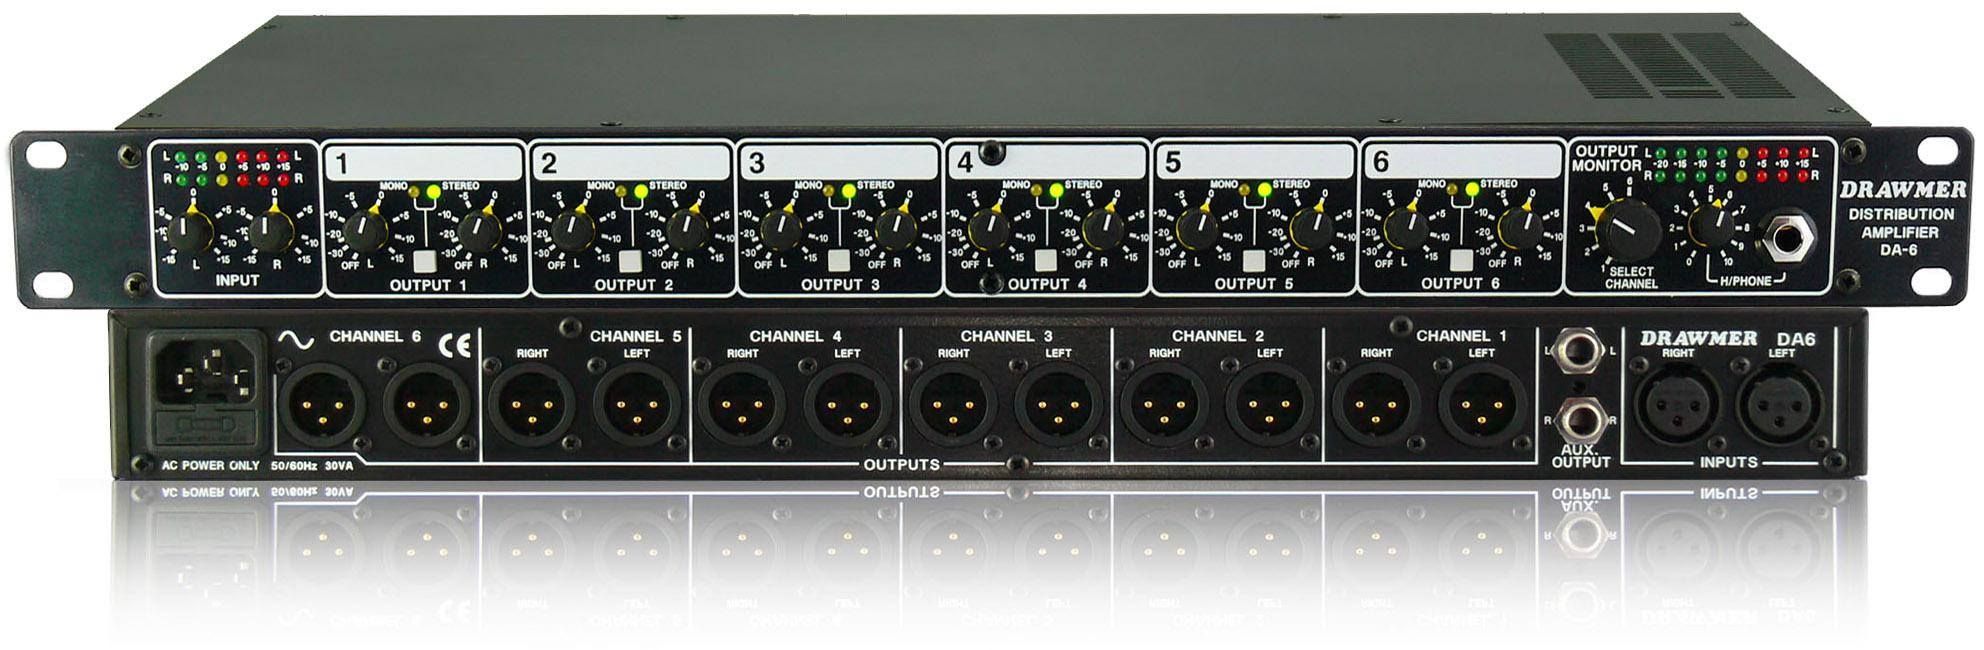 Balanced Audio Distribution Amplifier Schematic Trusted Wiring Diagram Composed Of Lm324 Basiccircuit Circuit Seekiccom Drawmer Electronics Da6 Transformer